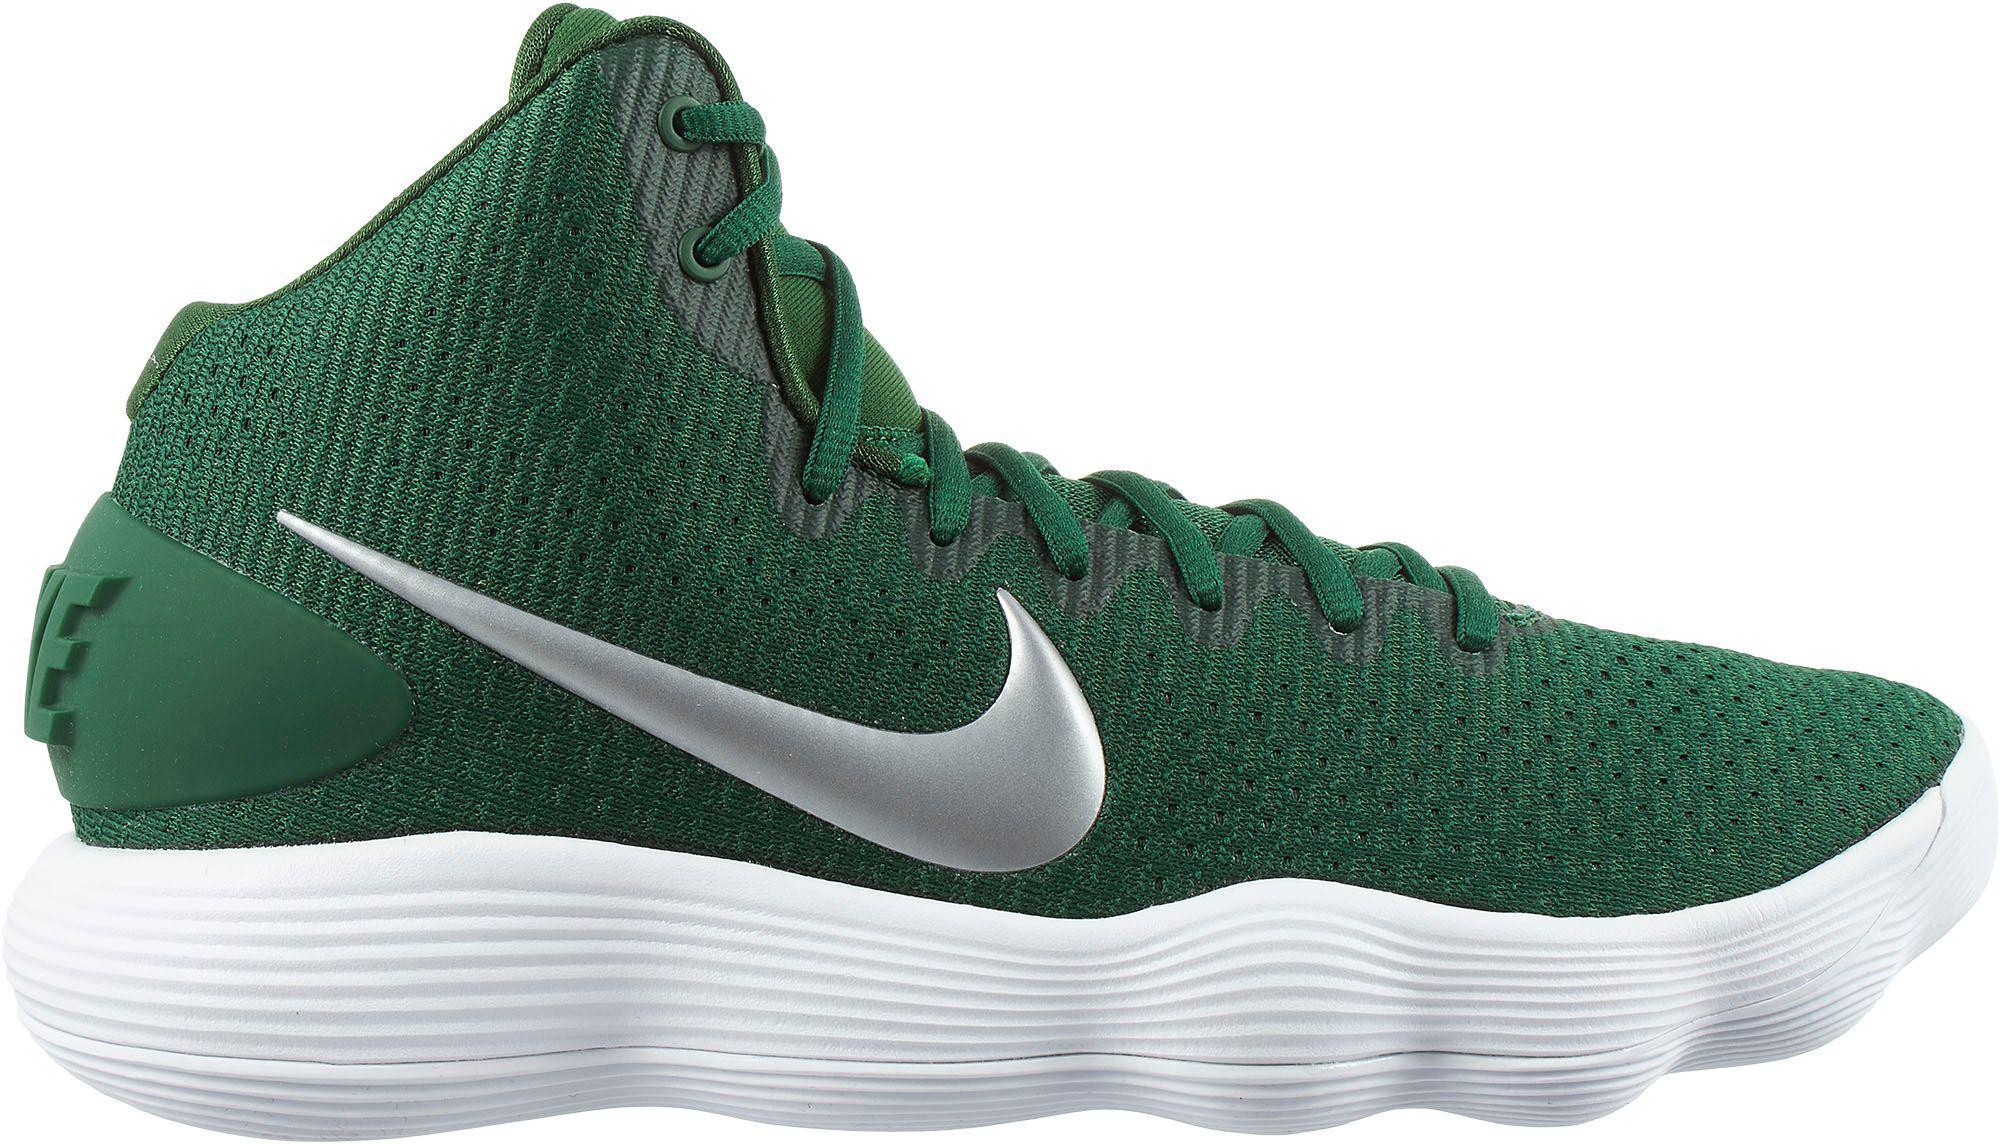 8a31039eab83 Nike React Hyperdunk 2017 Basketball Shoes in Green for Men - Lyst